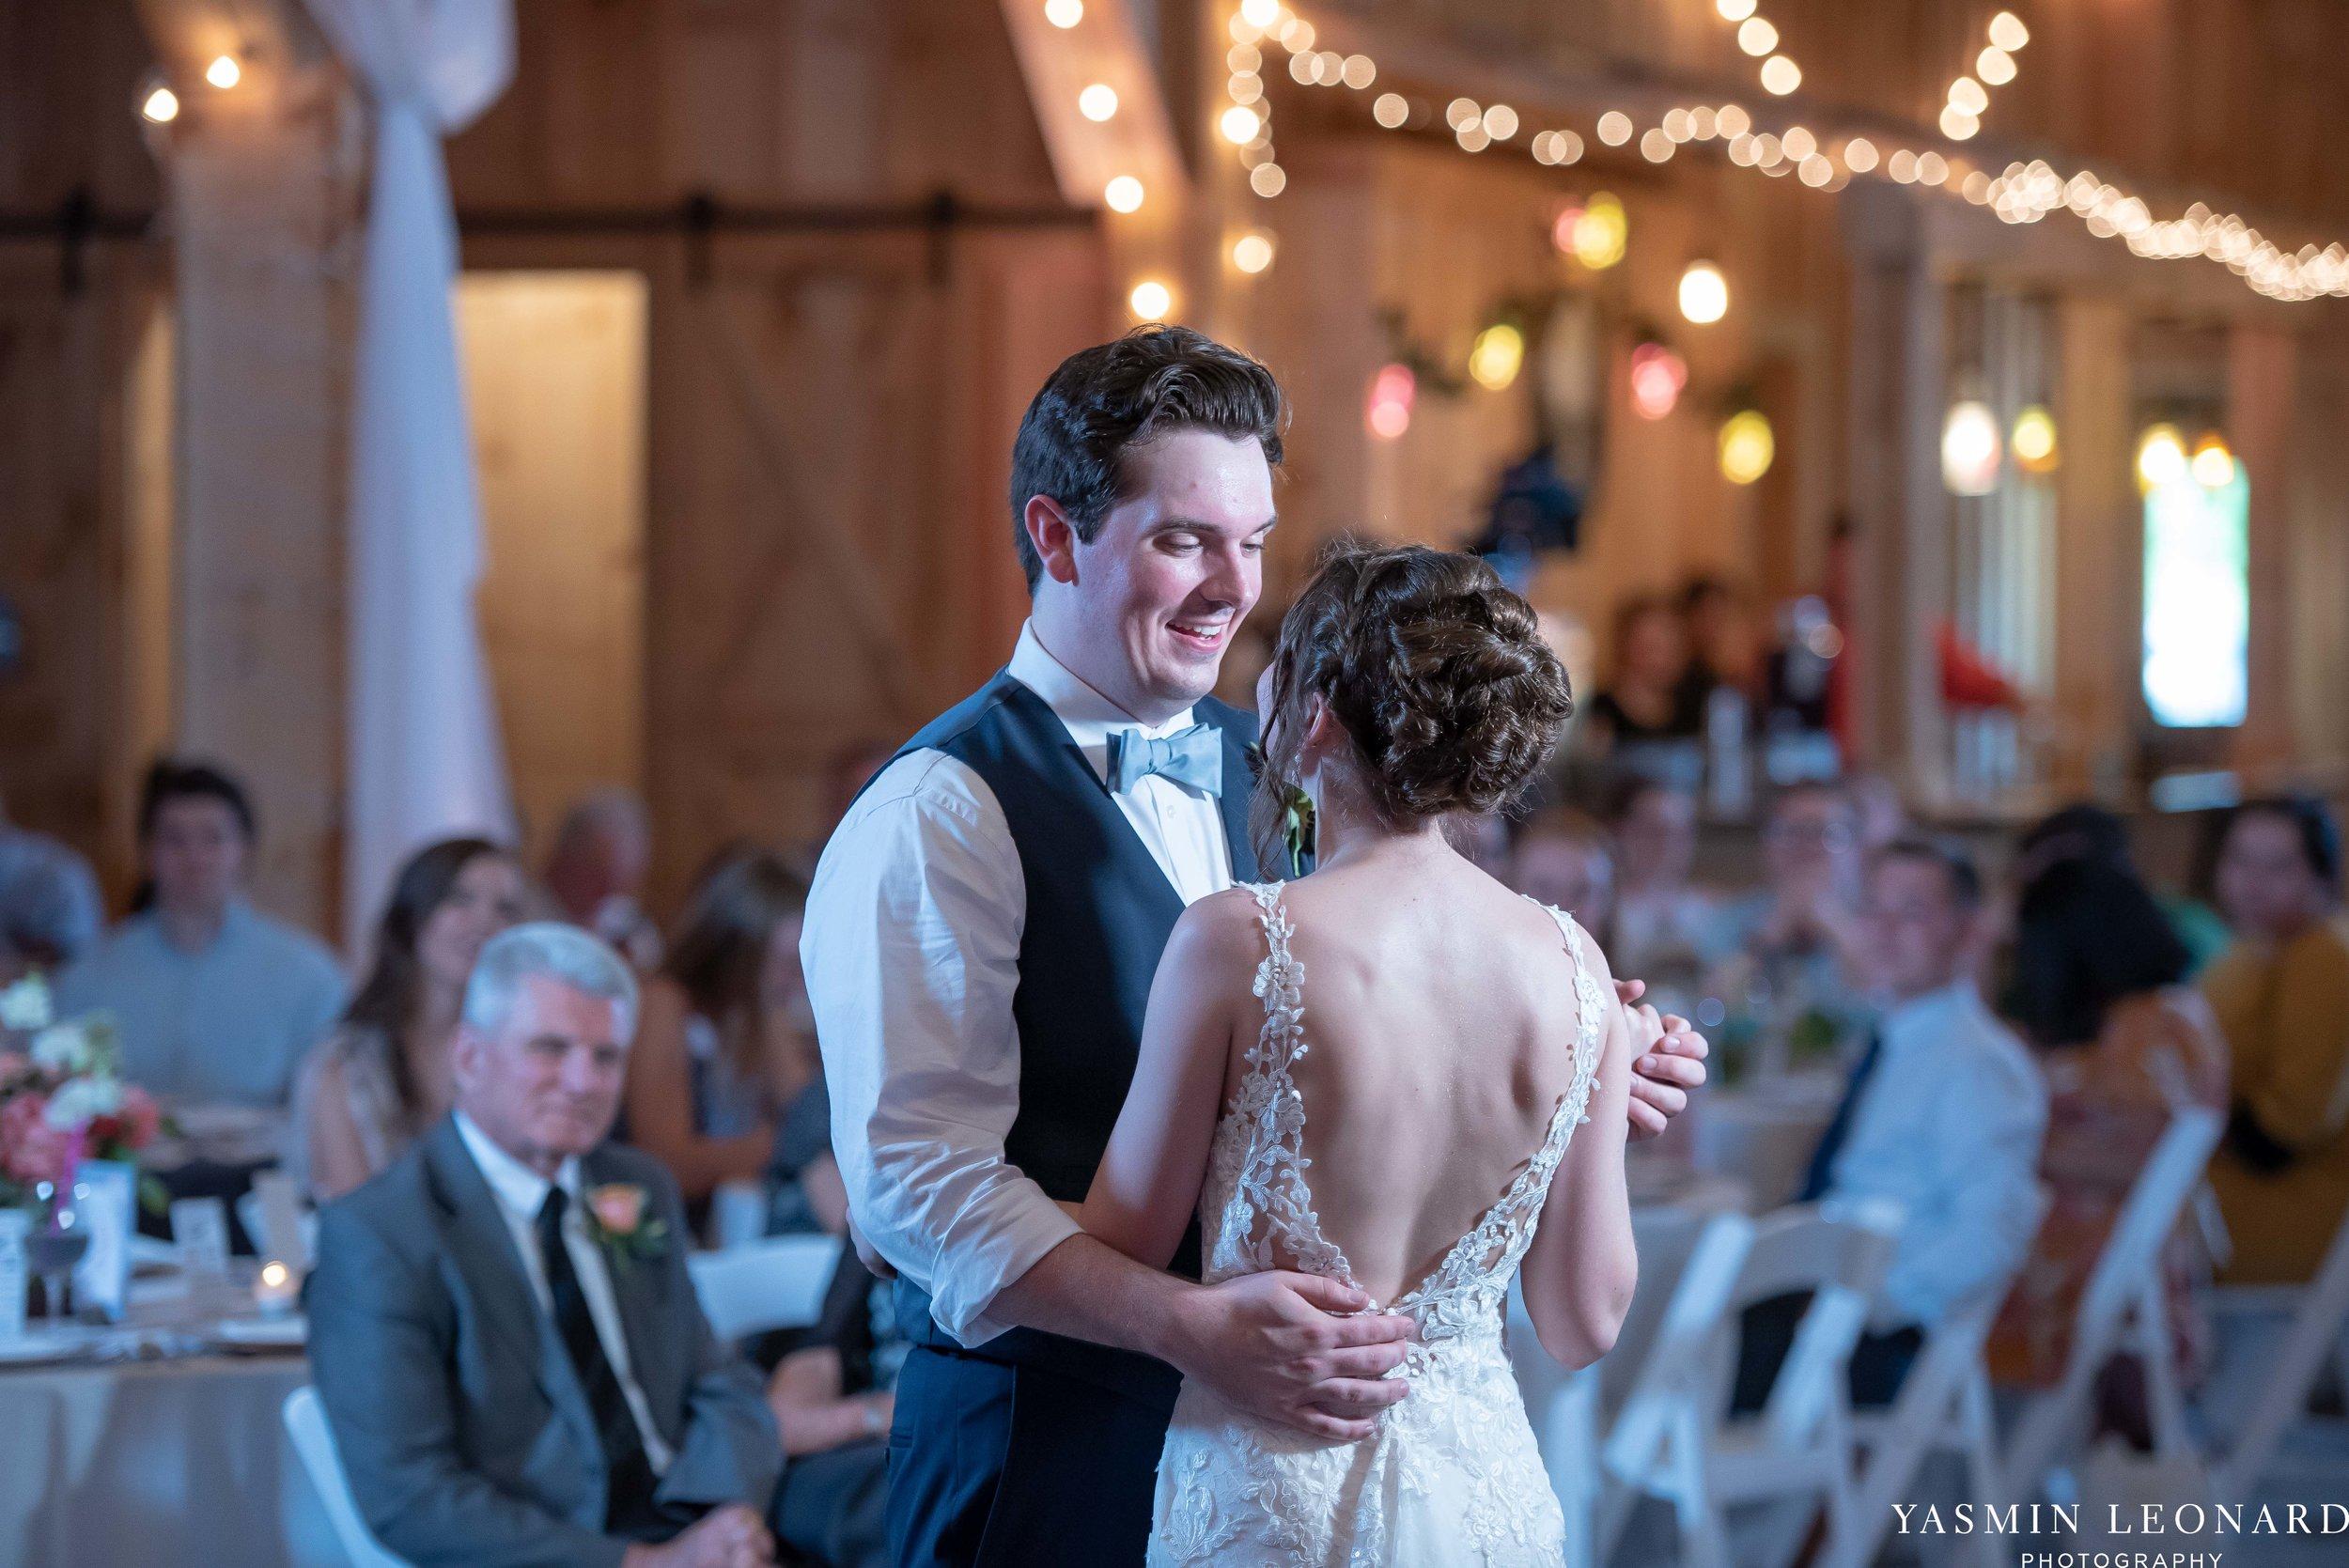 Old Homeplace Vineyard - NC Weddings - Outdoor Summer Weddings - Peony Boutique - Vineyard Wedding - NC Photographer - Yasmin Leonard Photography-52.jpg